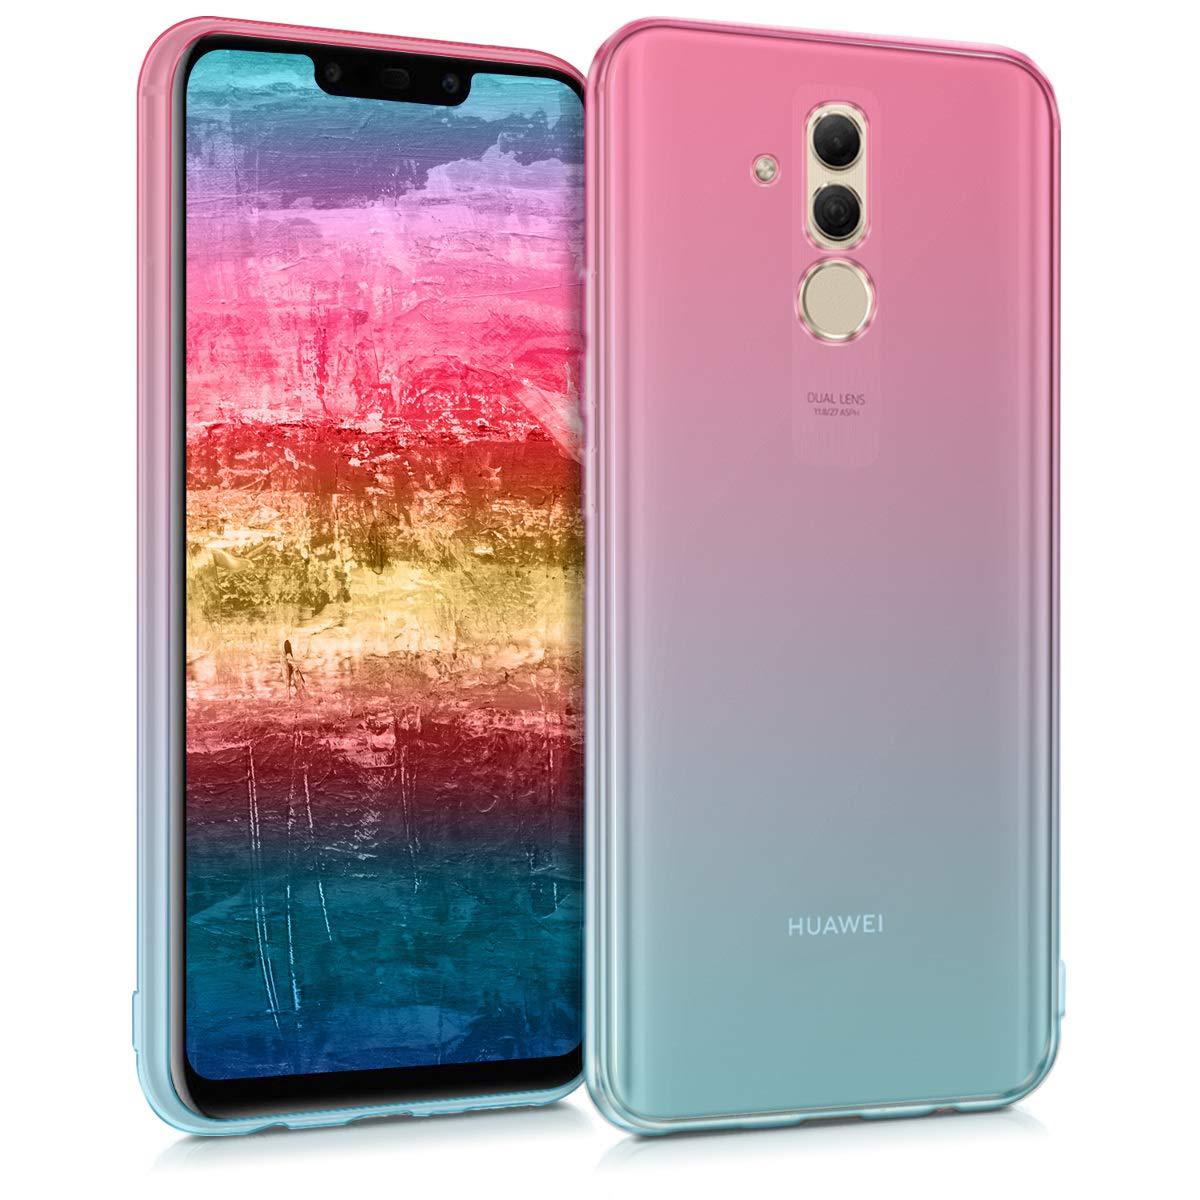 Funda Para Huawei Mate 20 Lite Kwmobile (7kx4g9bx)